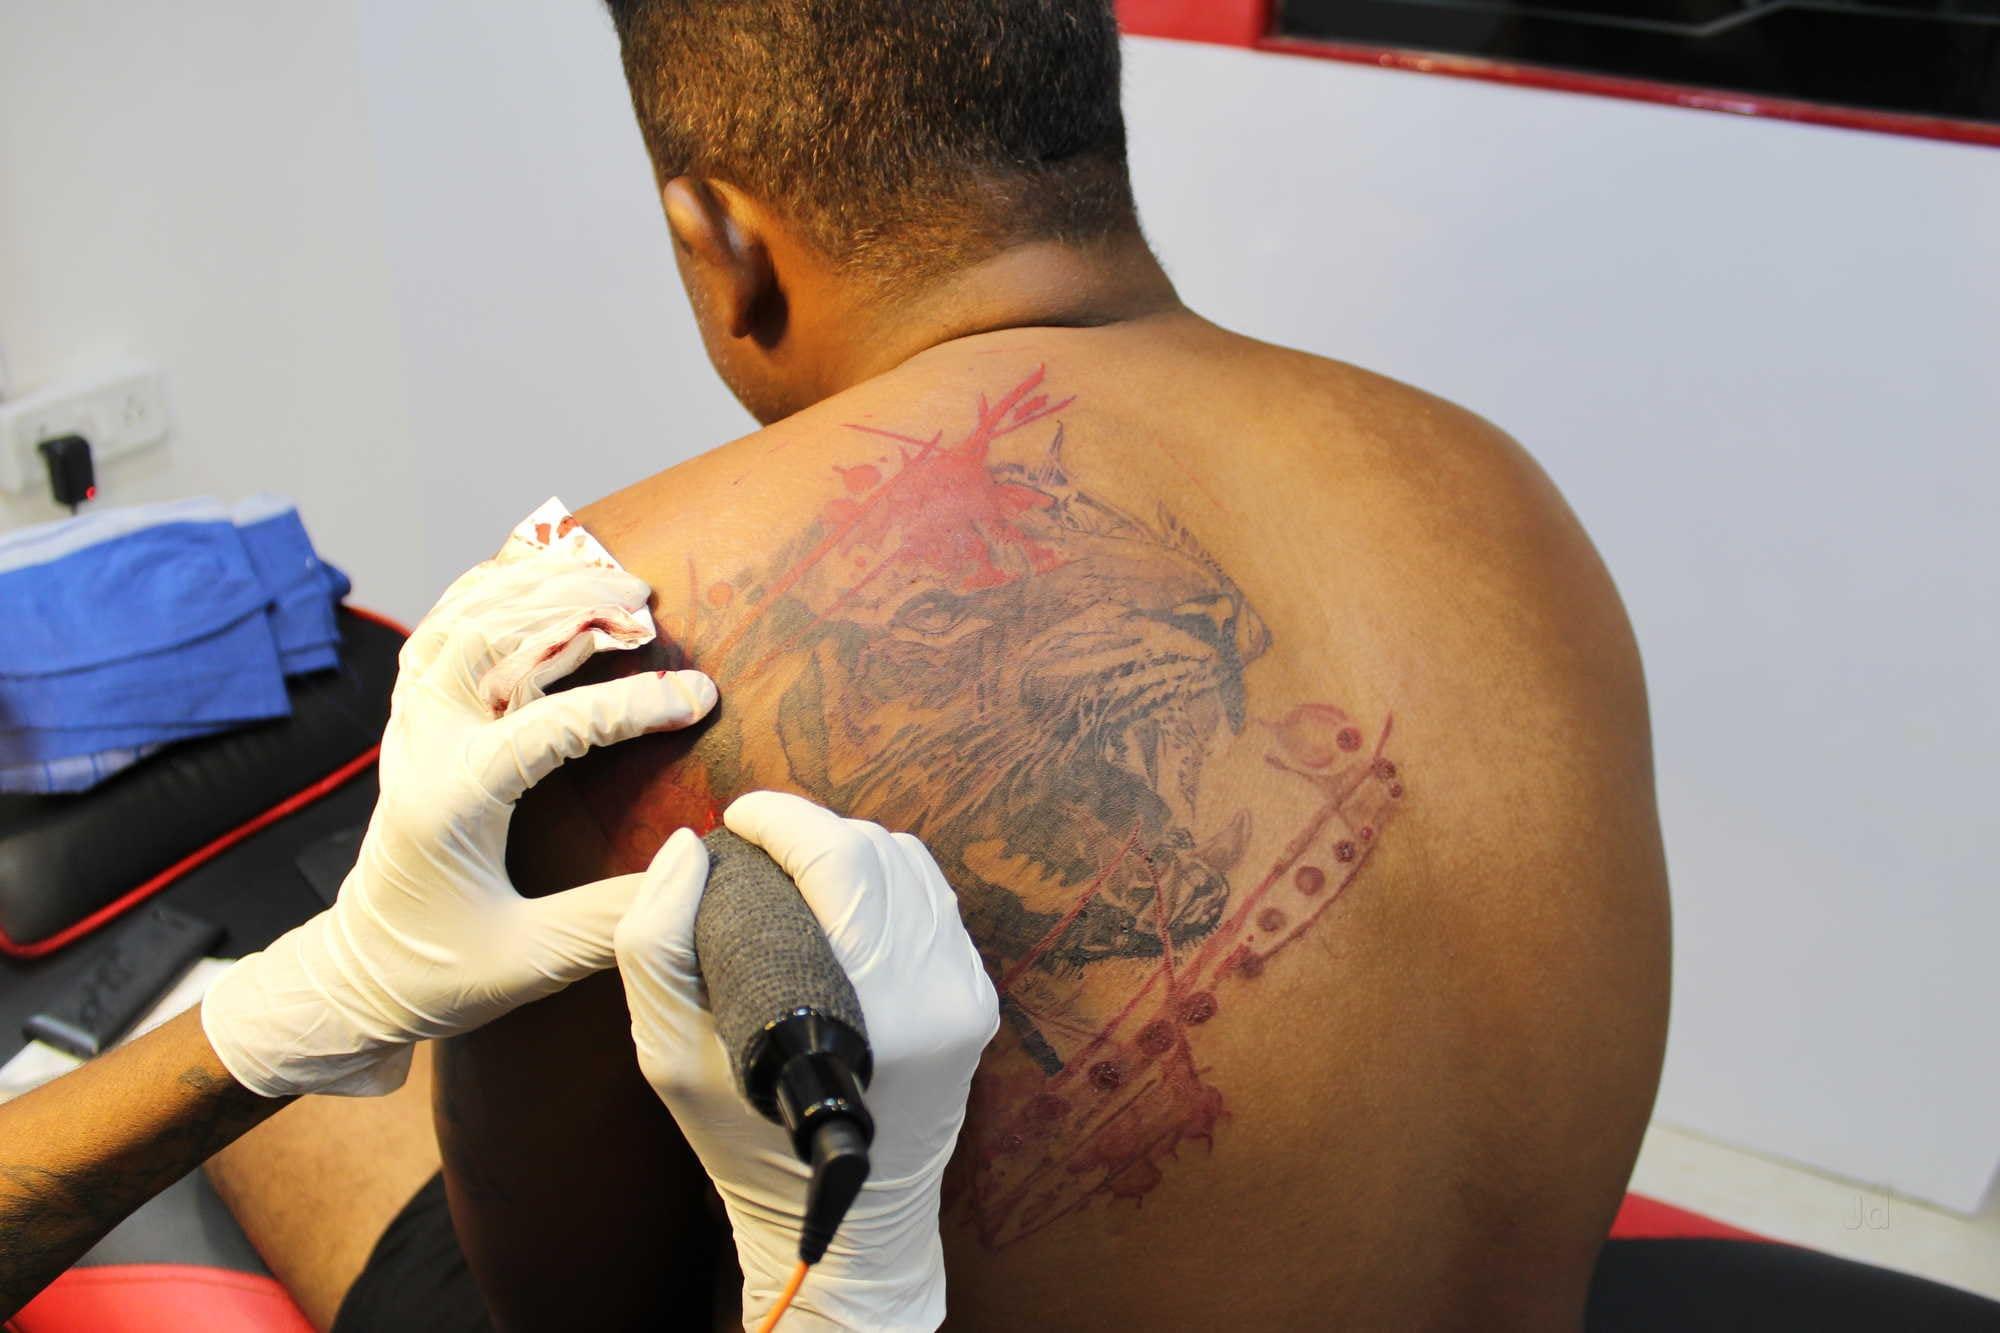 Top Tattoo Studio in Pondicherry, Pondicherry - Best Needless Tattoo ...